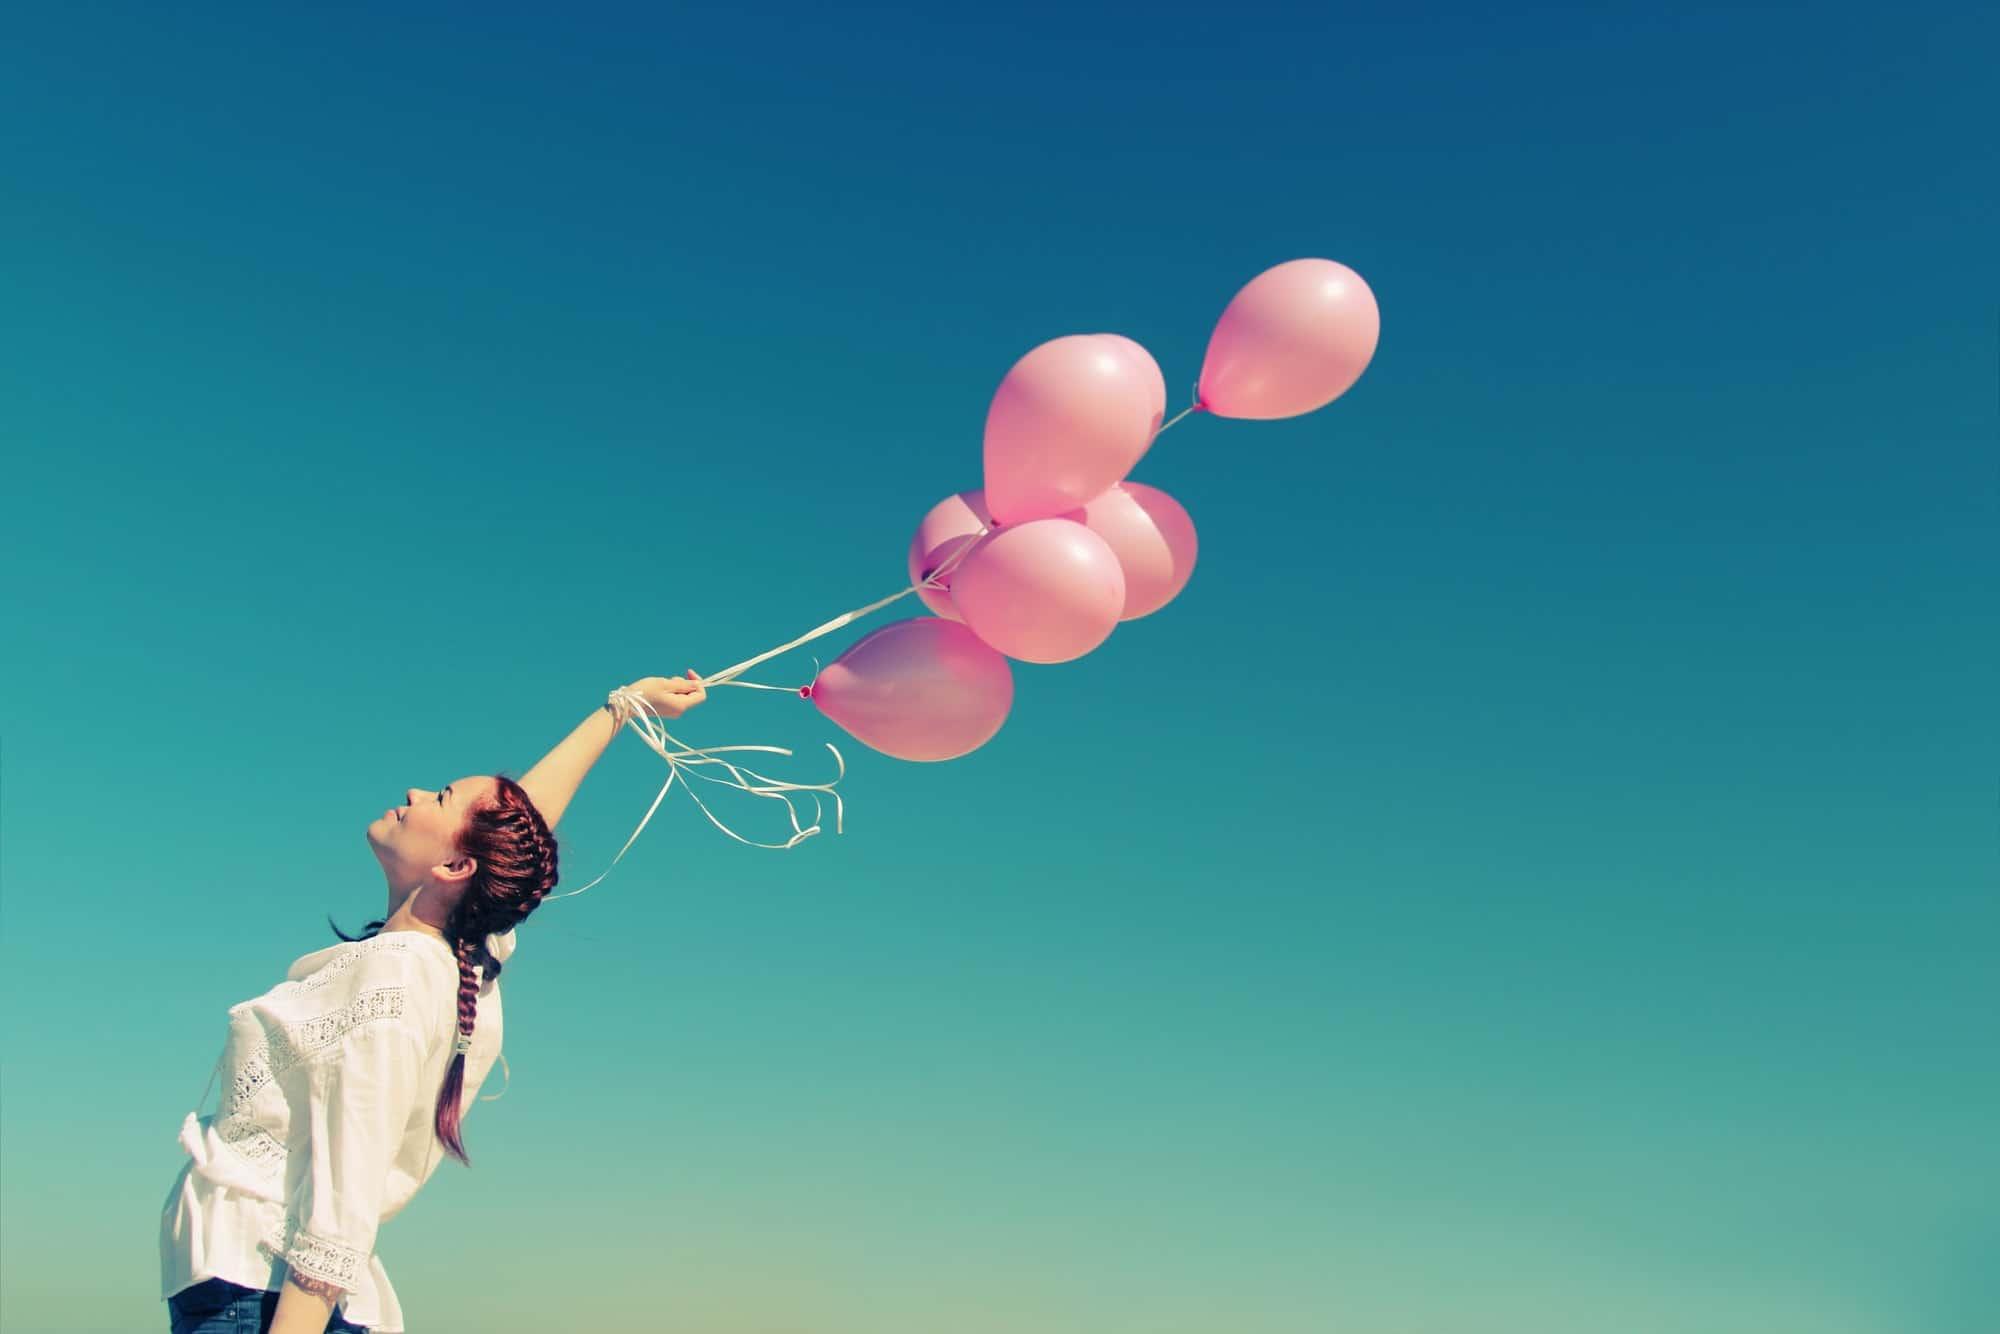 woman with balloons no apologies for positive attitude bloominash